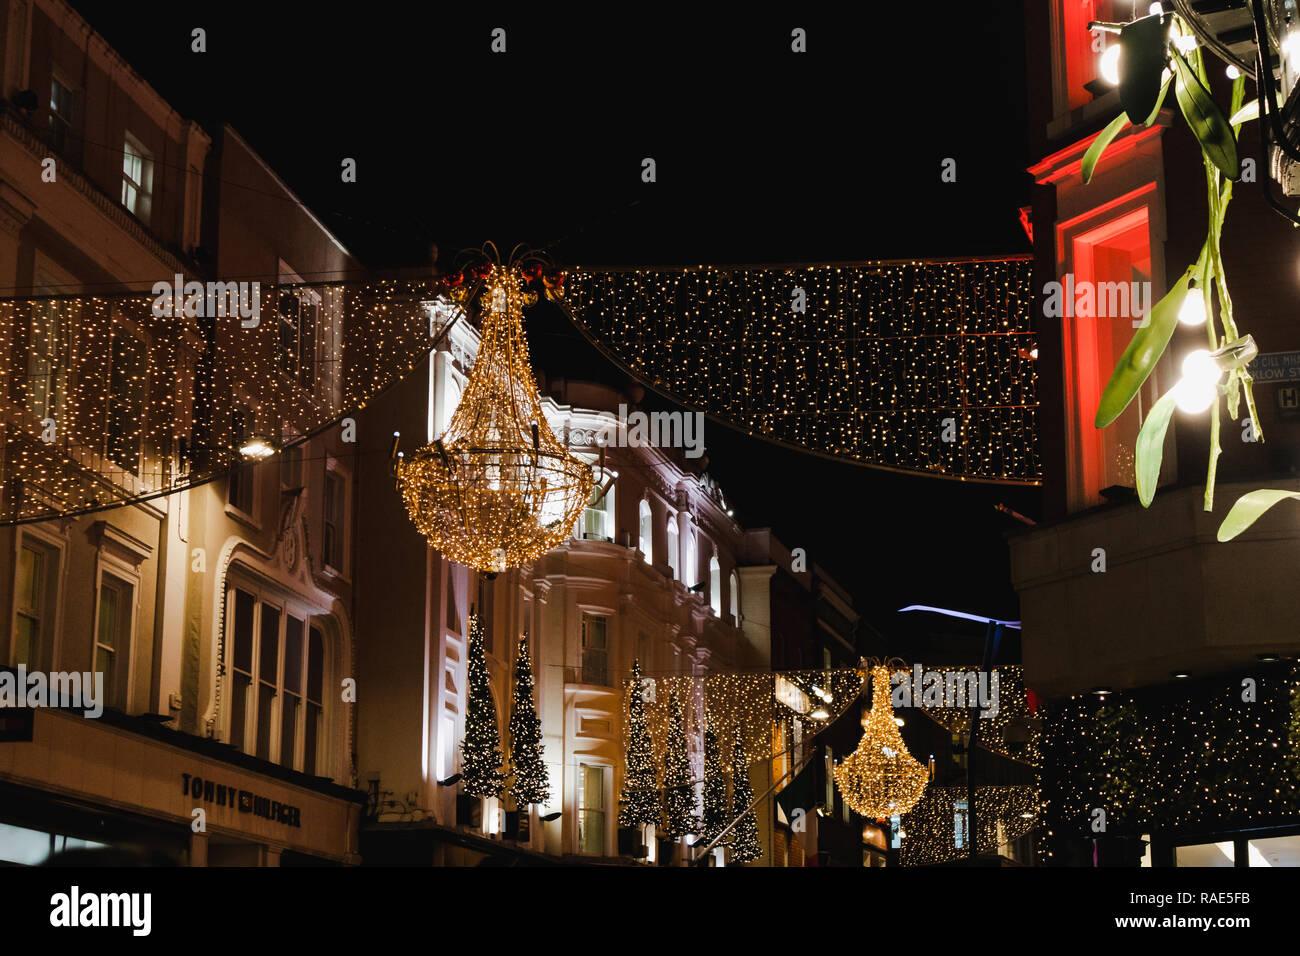 Christmas In Dublin Ireland.Dublin Ireland December 19th 2018 Christmas Lights In